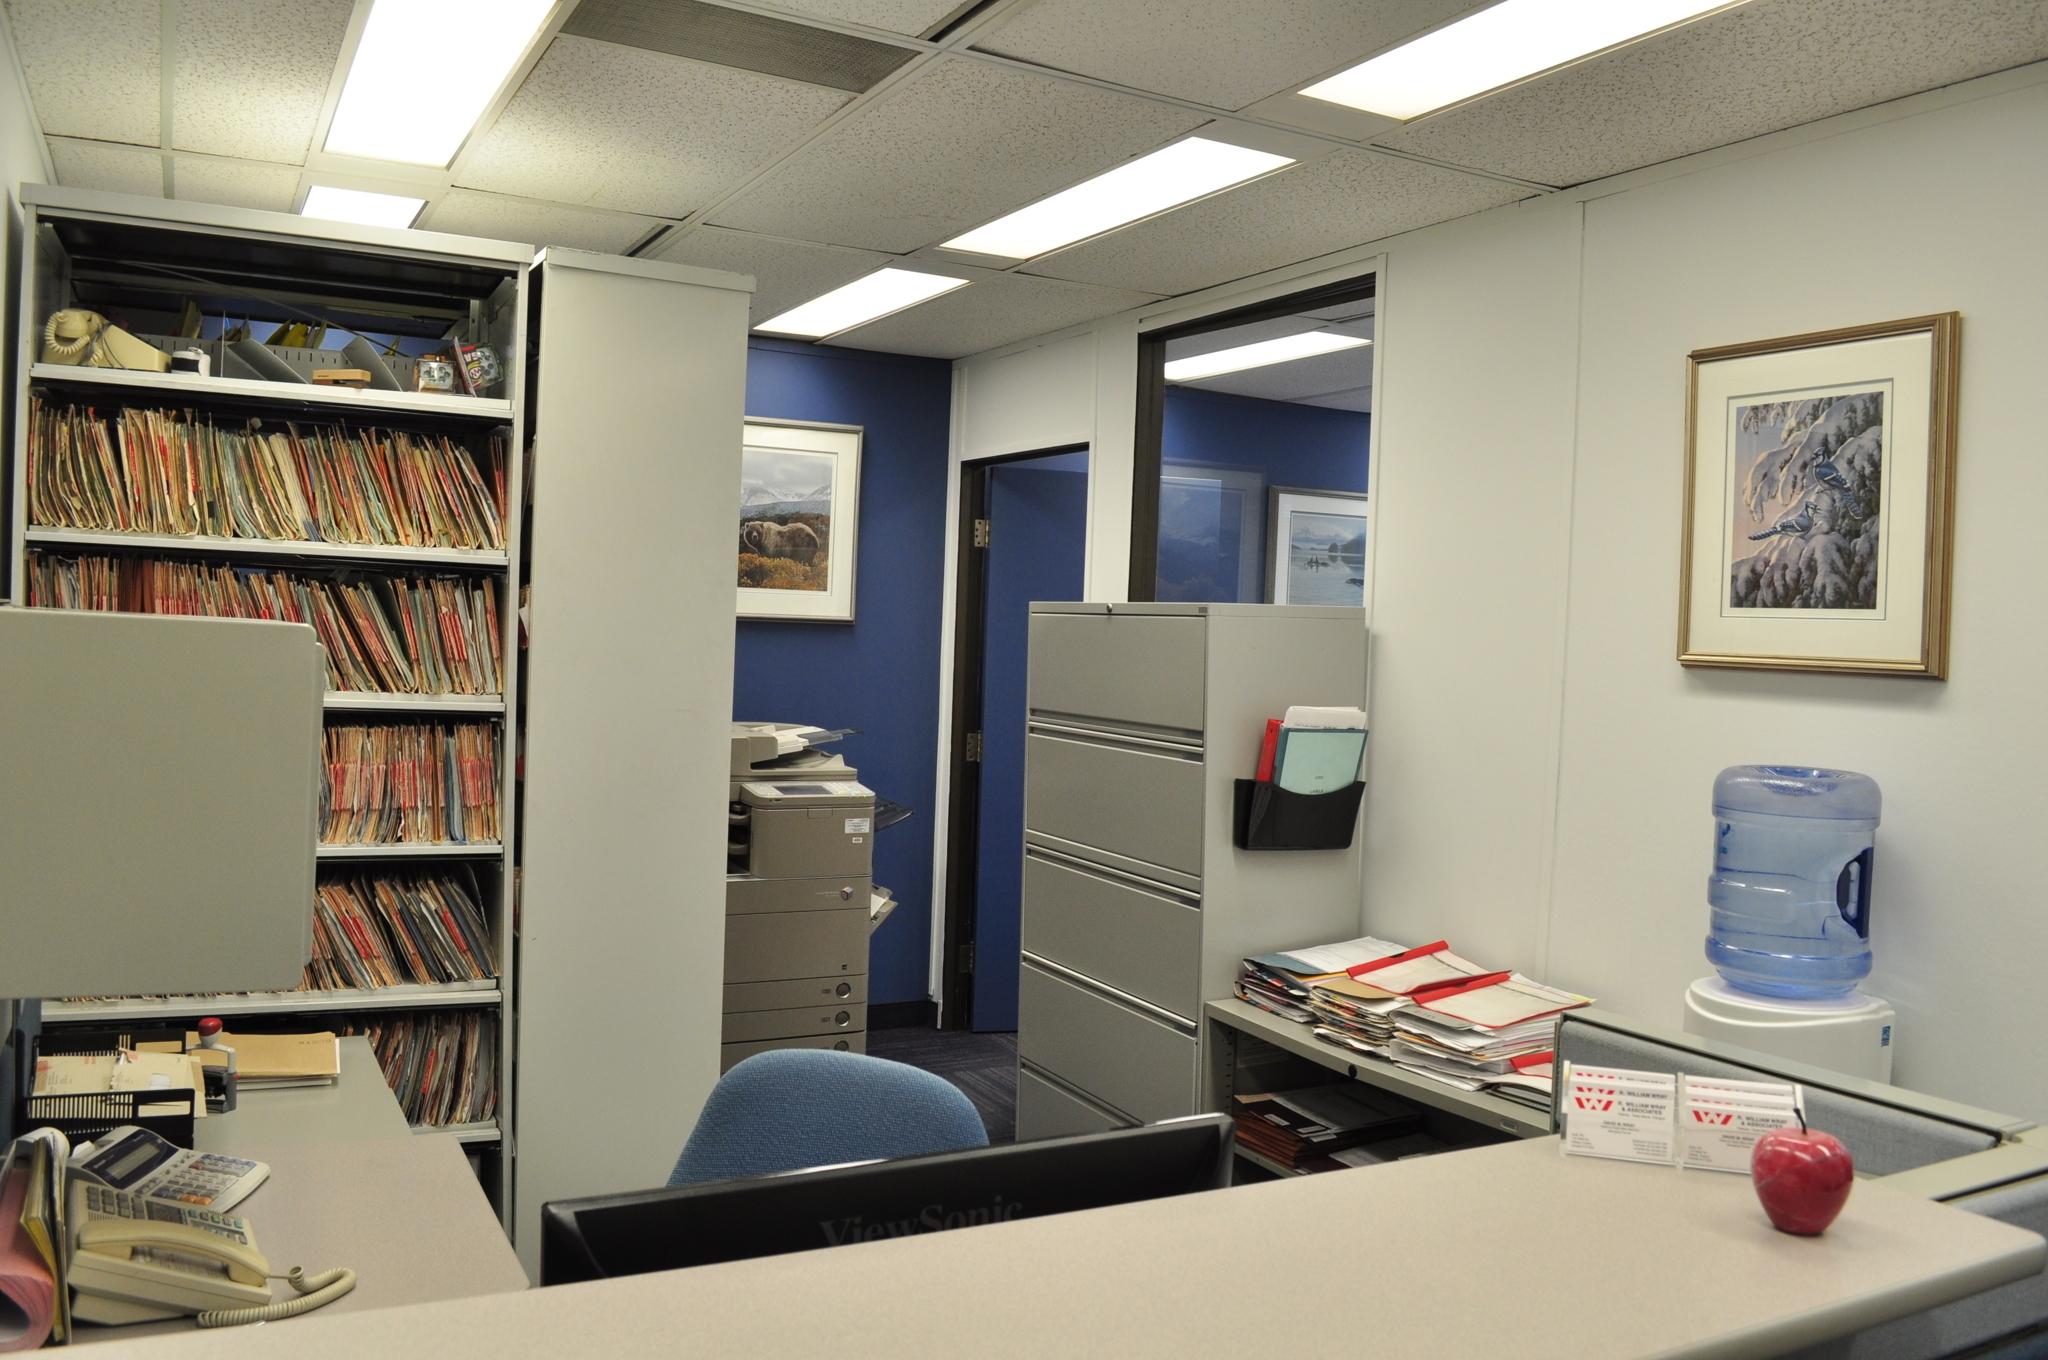 Wray R William & Associates in Ottawa